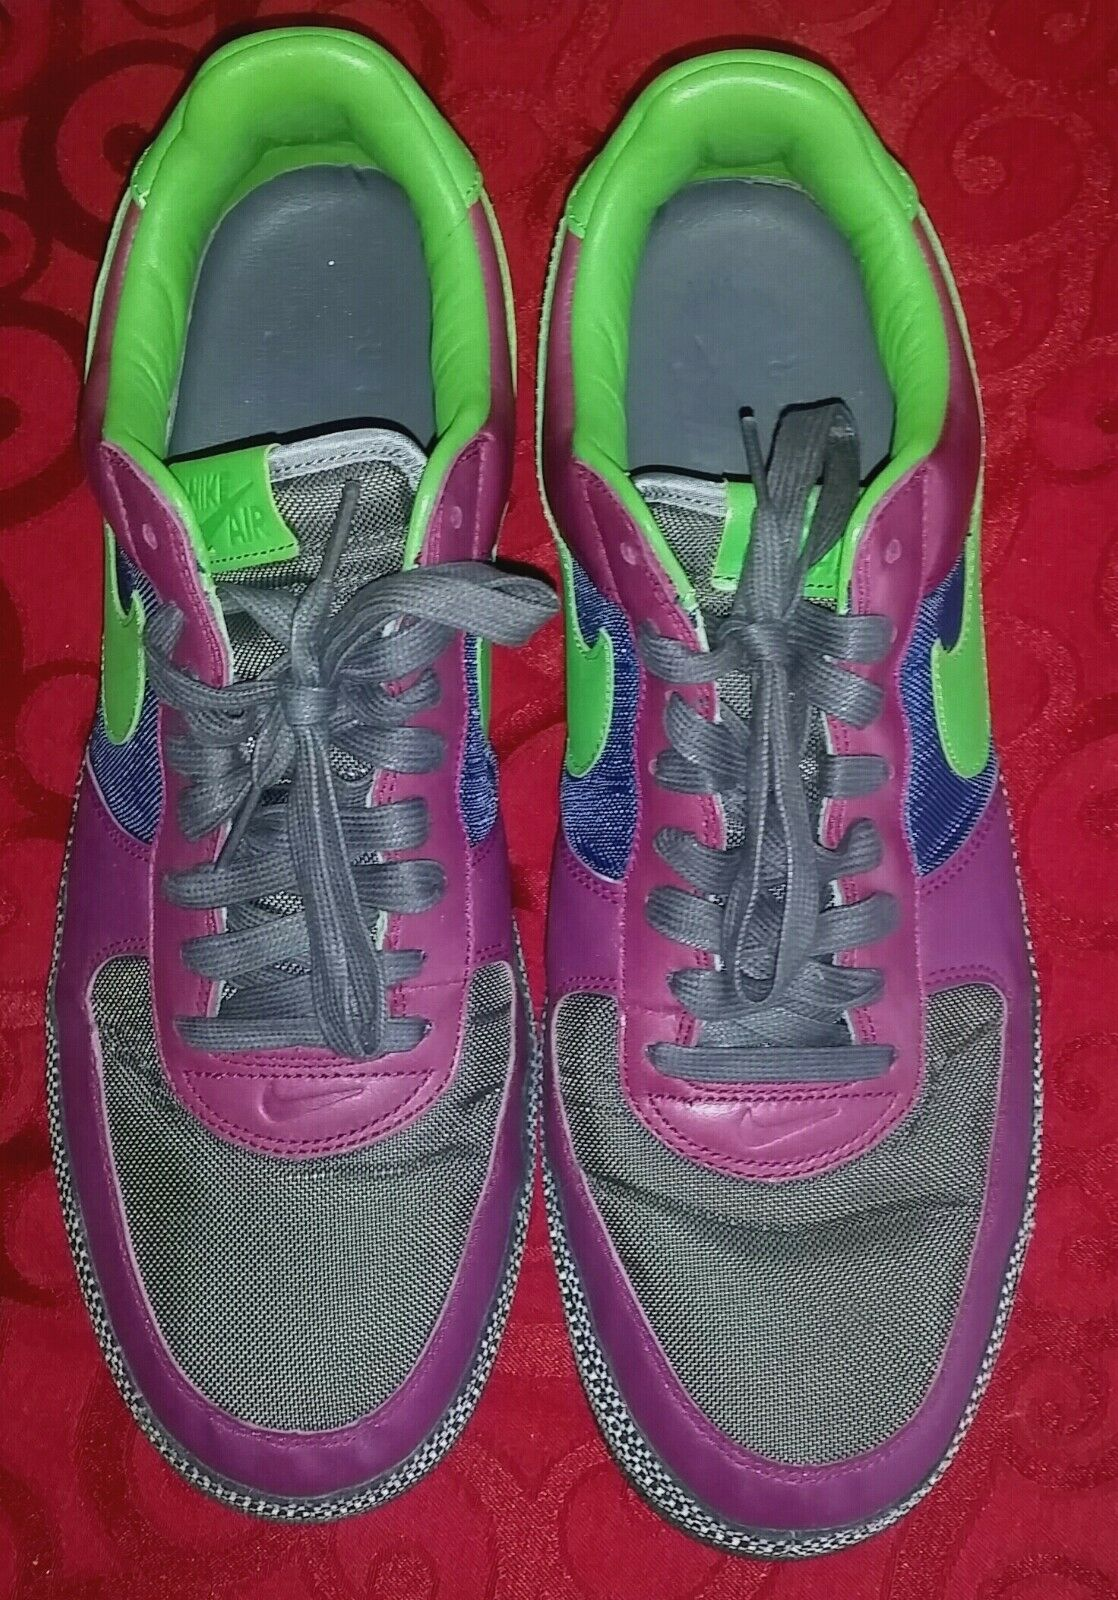 Nike Air Force 1 Purple/Green/Blue/ Black & White Checker Pattern.